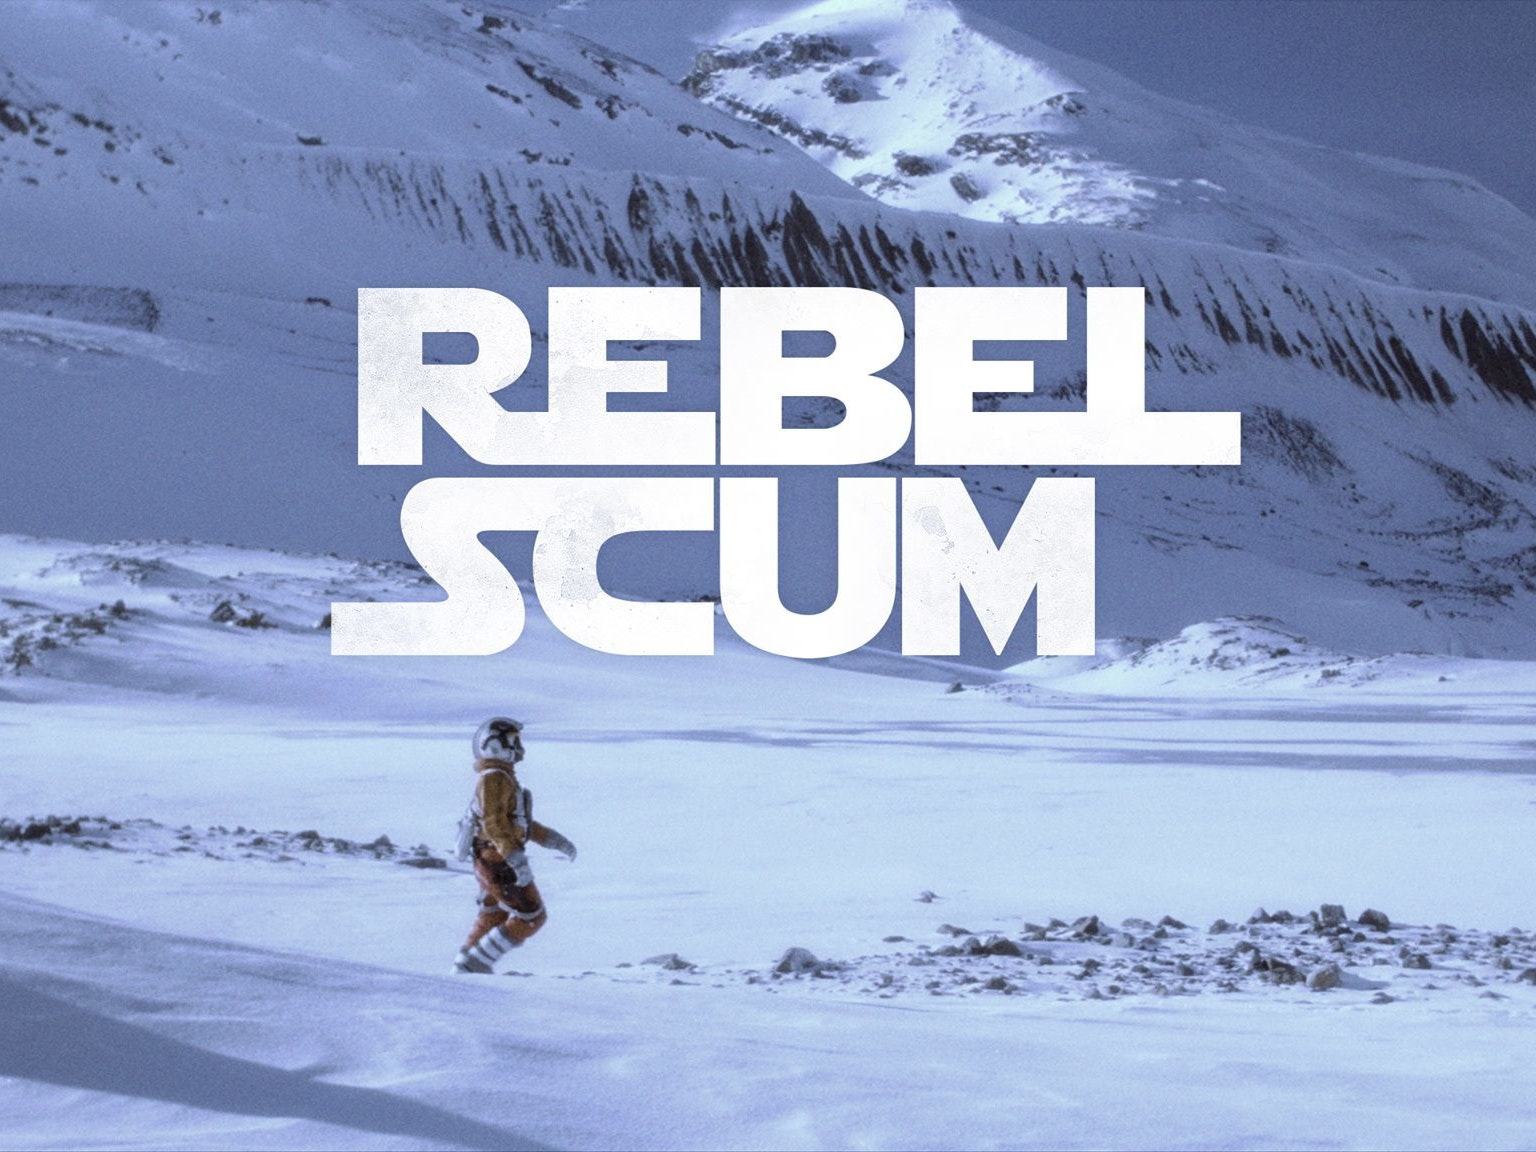 Star Wars Fan Film 'Rebel Scum' Is Too Good to Exist